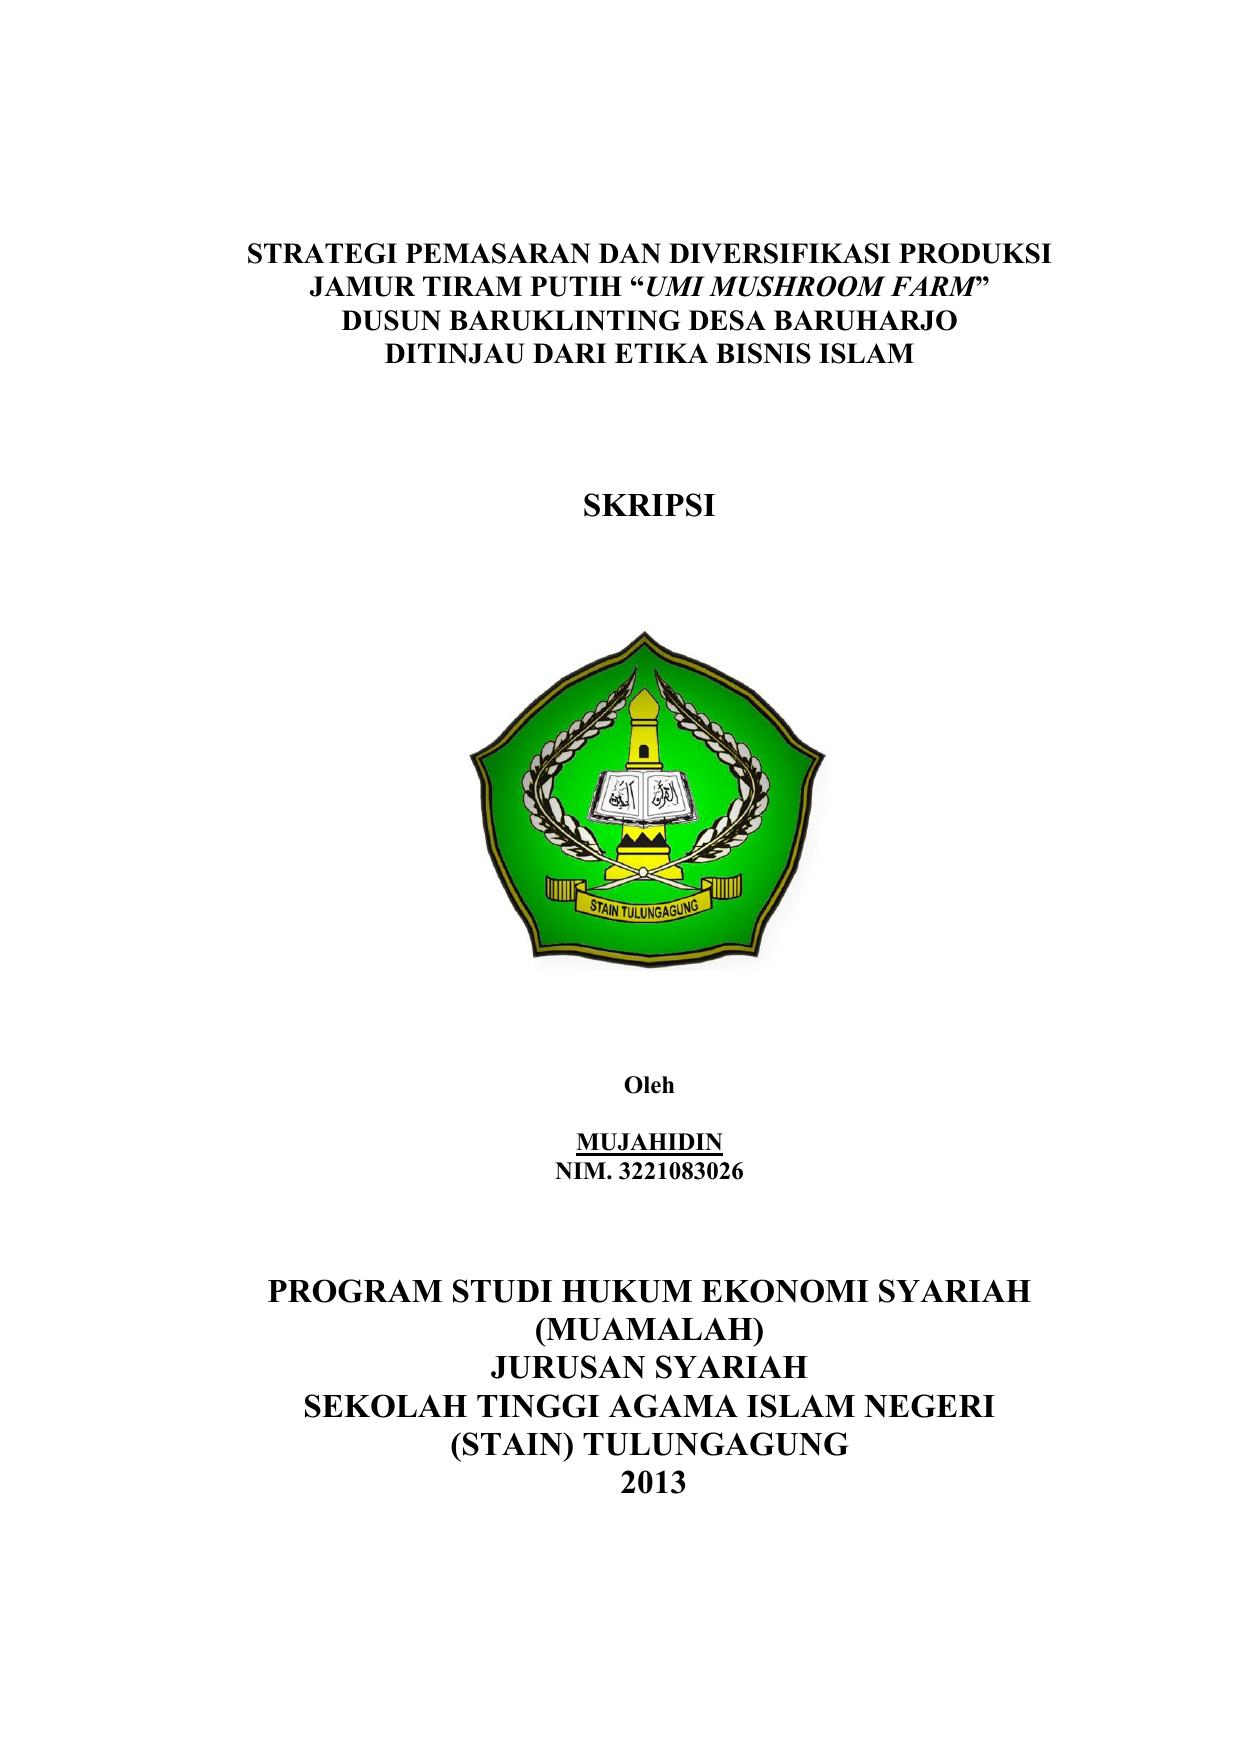 Skripsi Program Studi Hukum Ekonomi Syariah Muamalah